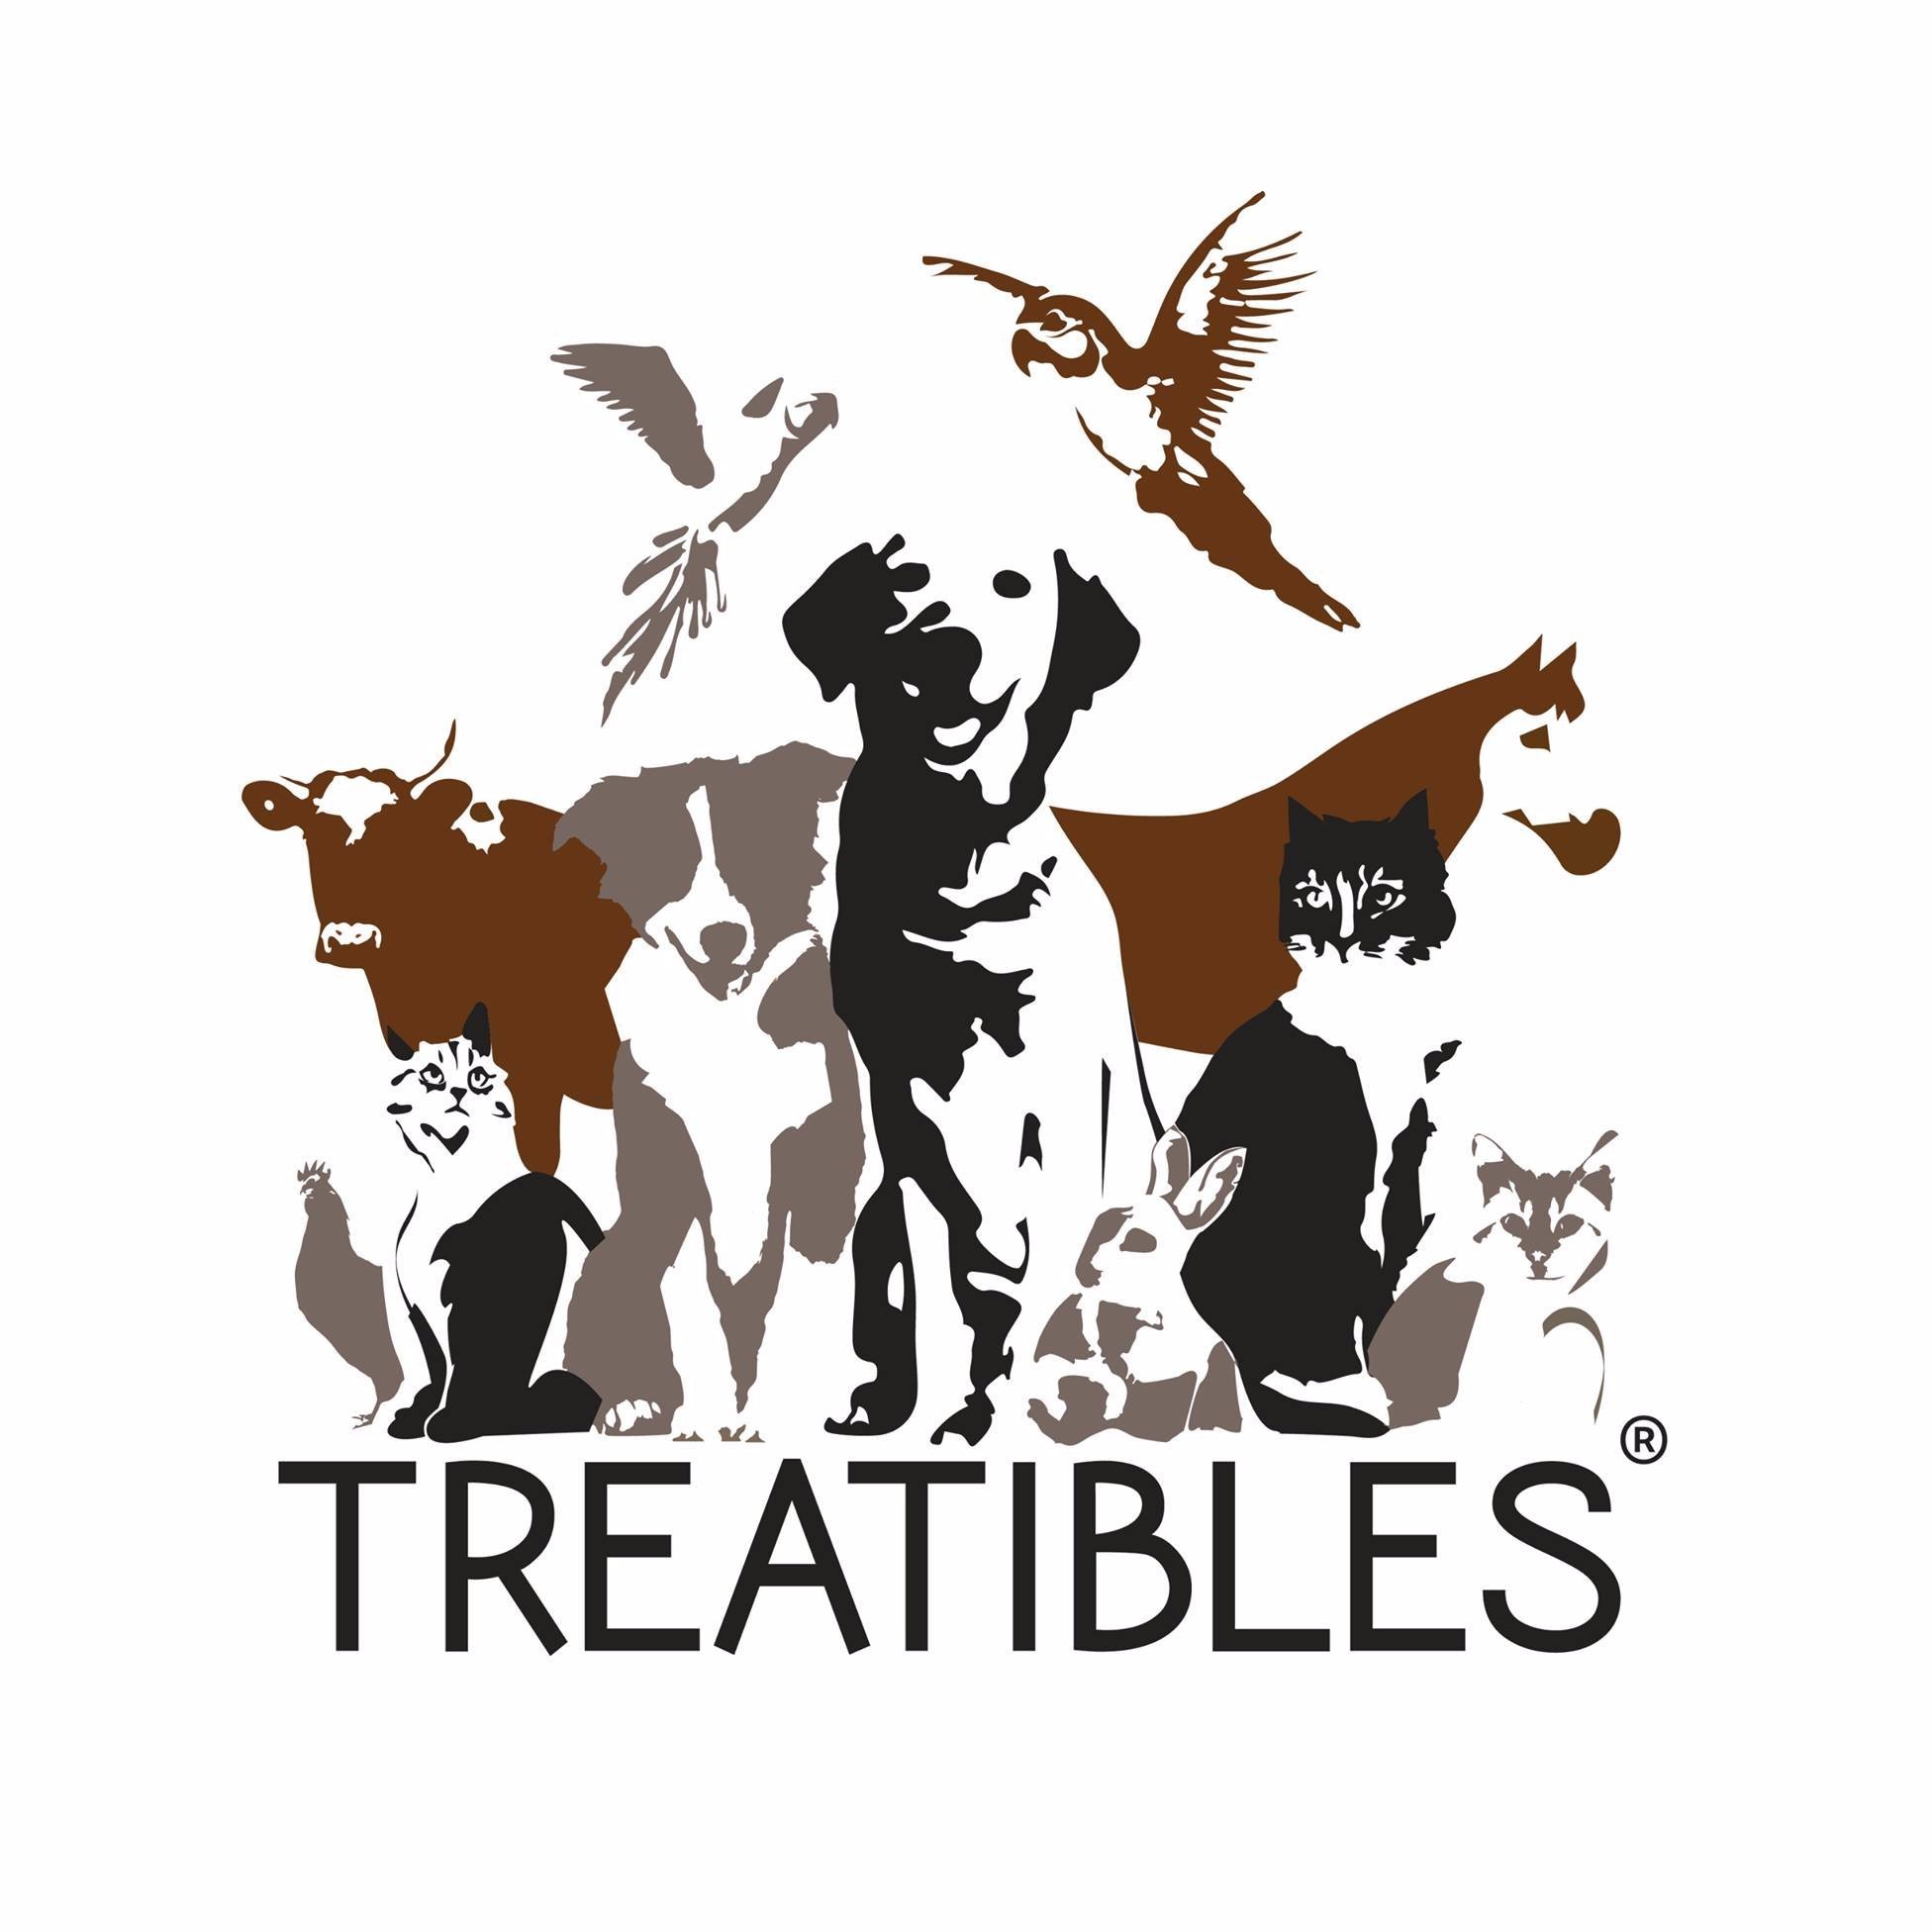 treatibles logo.jpg